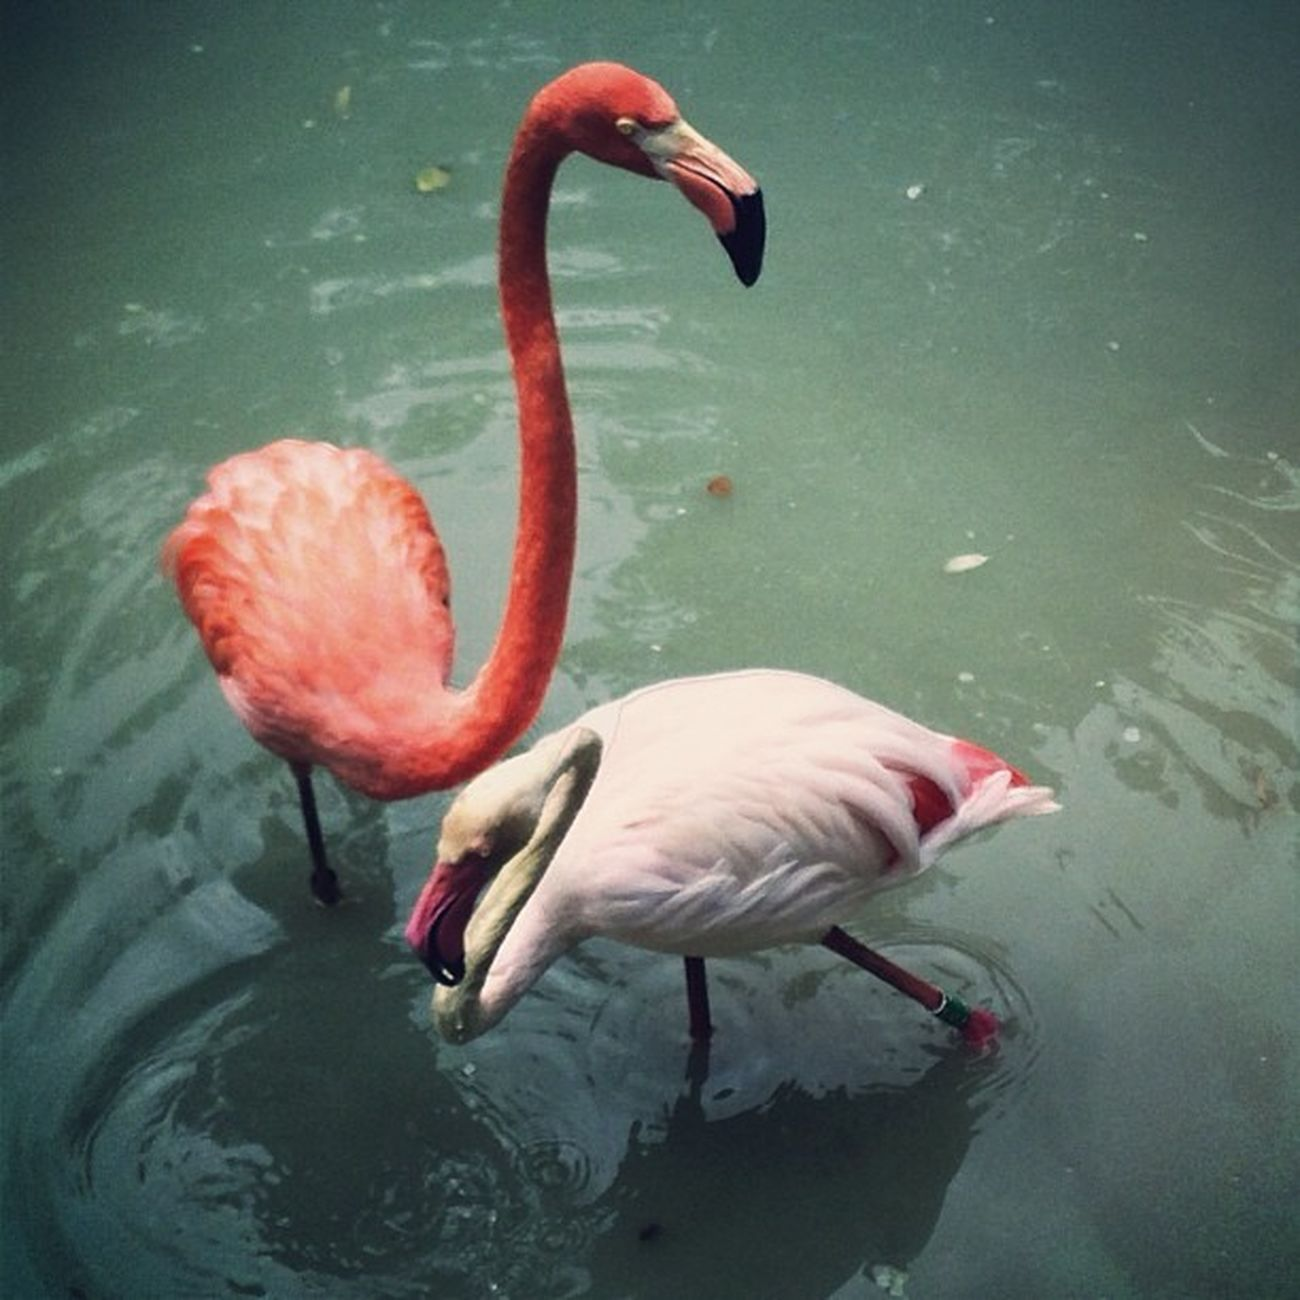 #киев #киевскийзоопарк #zoo #flamingo HRD_pics Киев Beautiful HDR Real_ukraine Ukraine_art инстаграм_порусски Amazing Insta_kyiv Zoo айфонография Flamingo Kiev киевскийзоопарк Iphoneonly Photooftheday Iphonesia Ukraine Photooftheweek украина